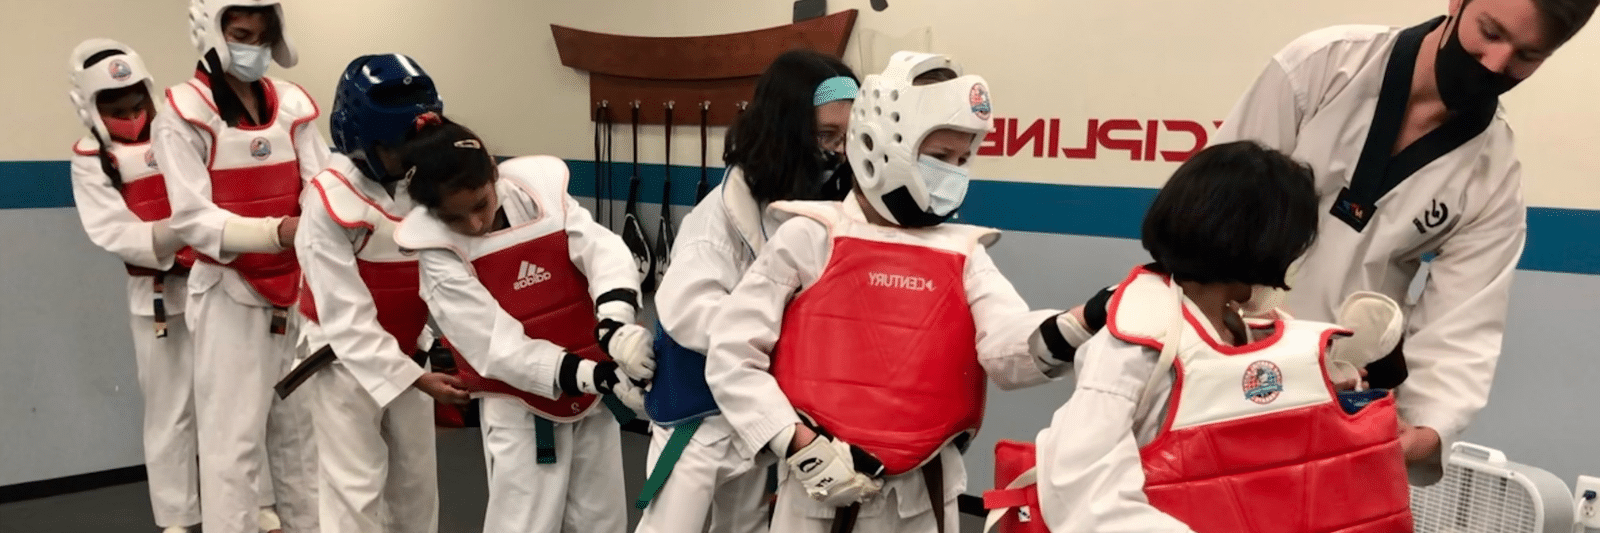 shows Taekwondo class getting ready for sparring in Novi MI